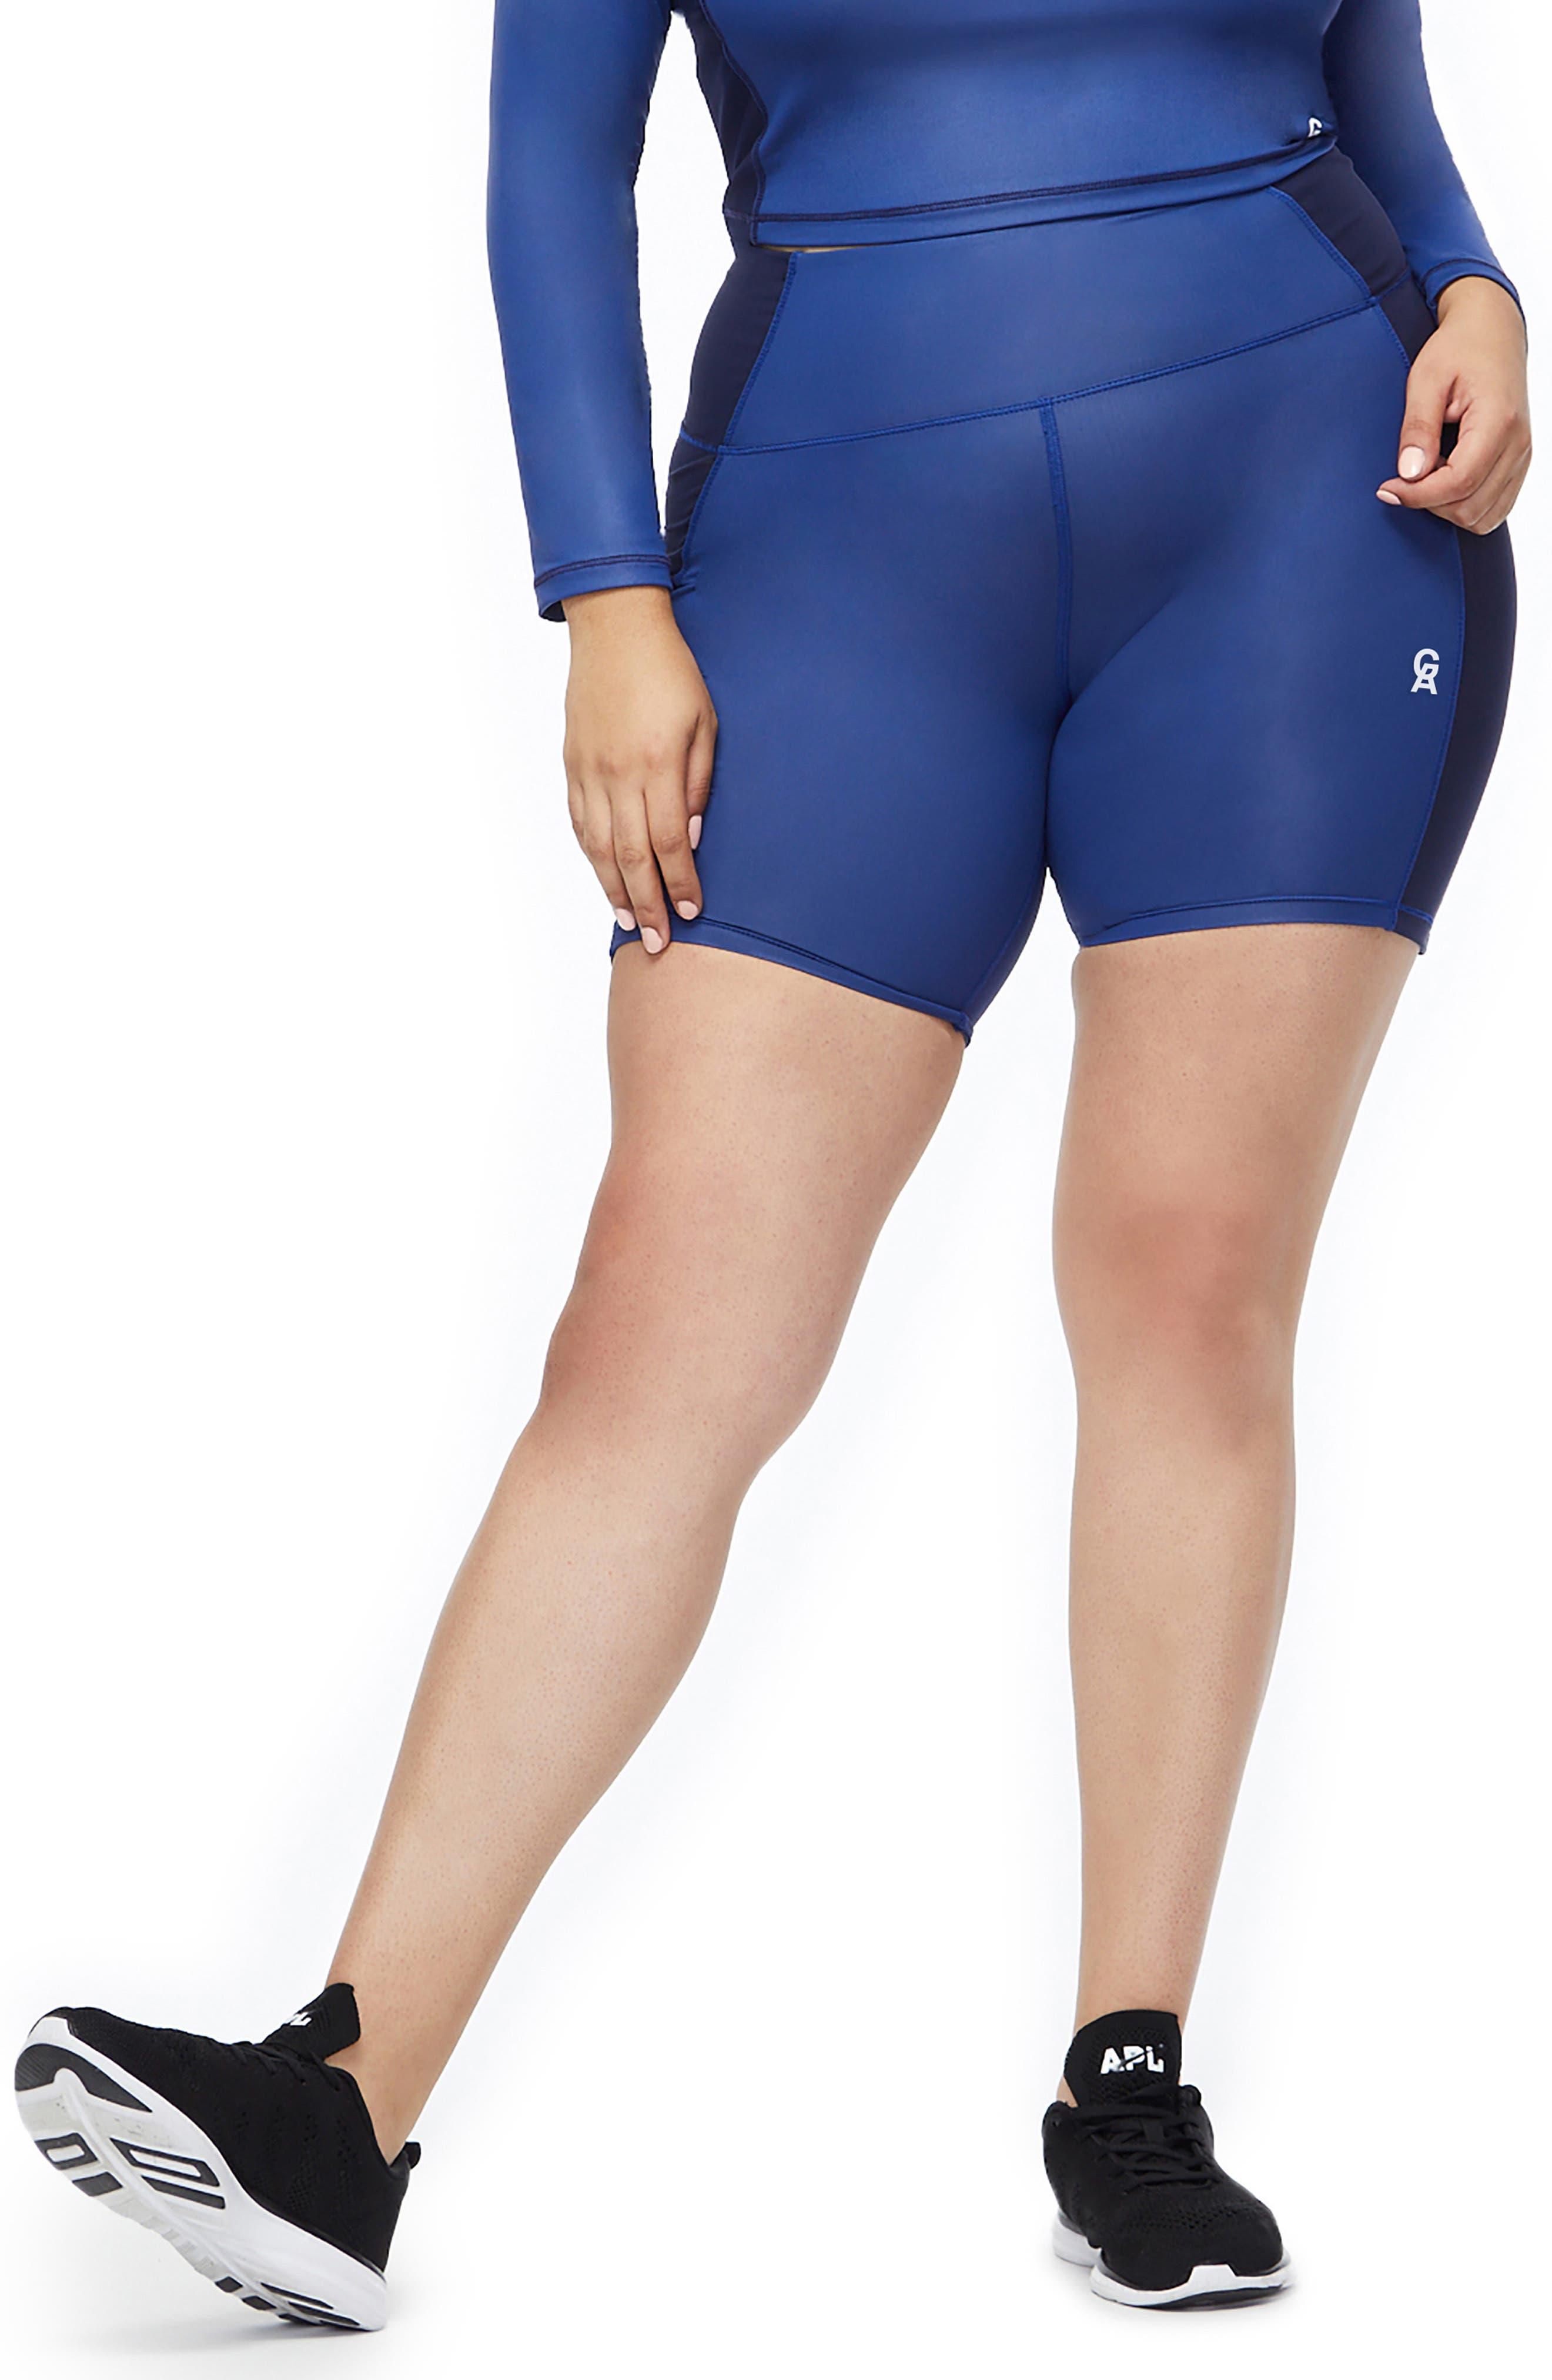 High Waist Biker Shorts,                             Alternate thumbnail 2, color,                             BLUE001